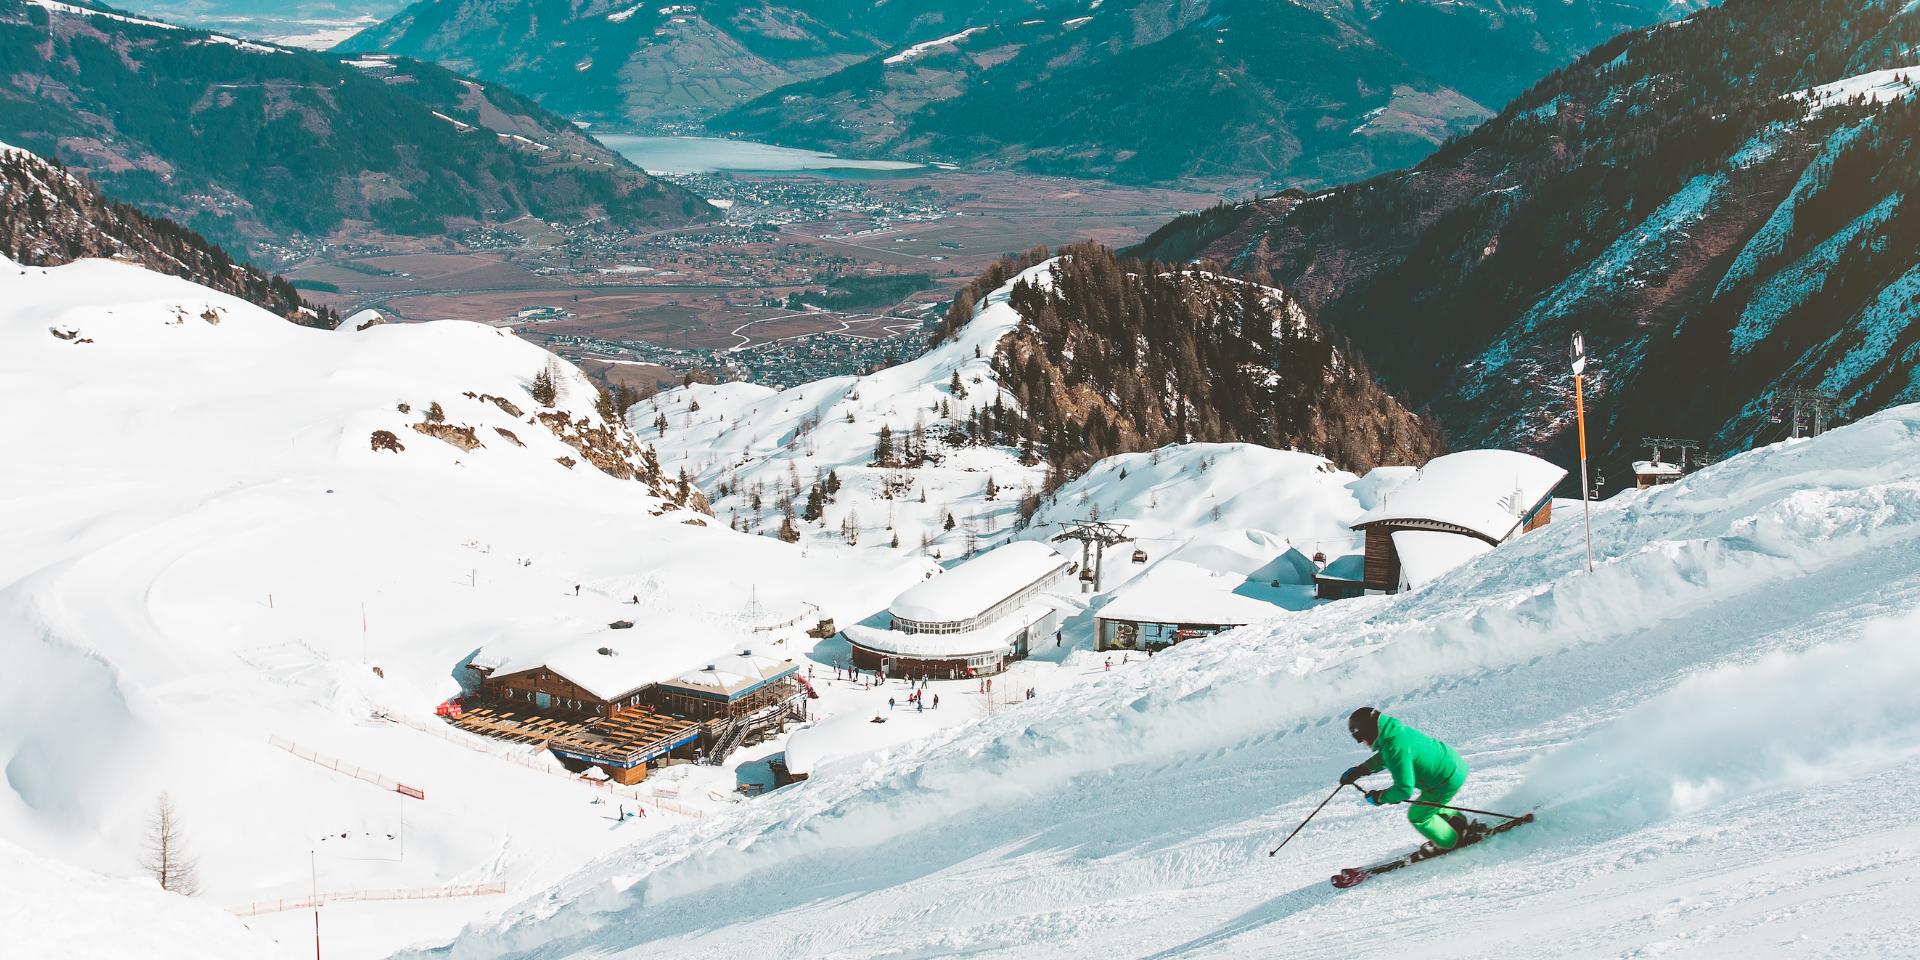 Skiën Montafongebied